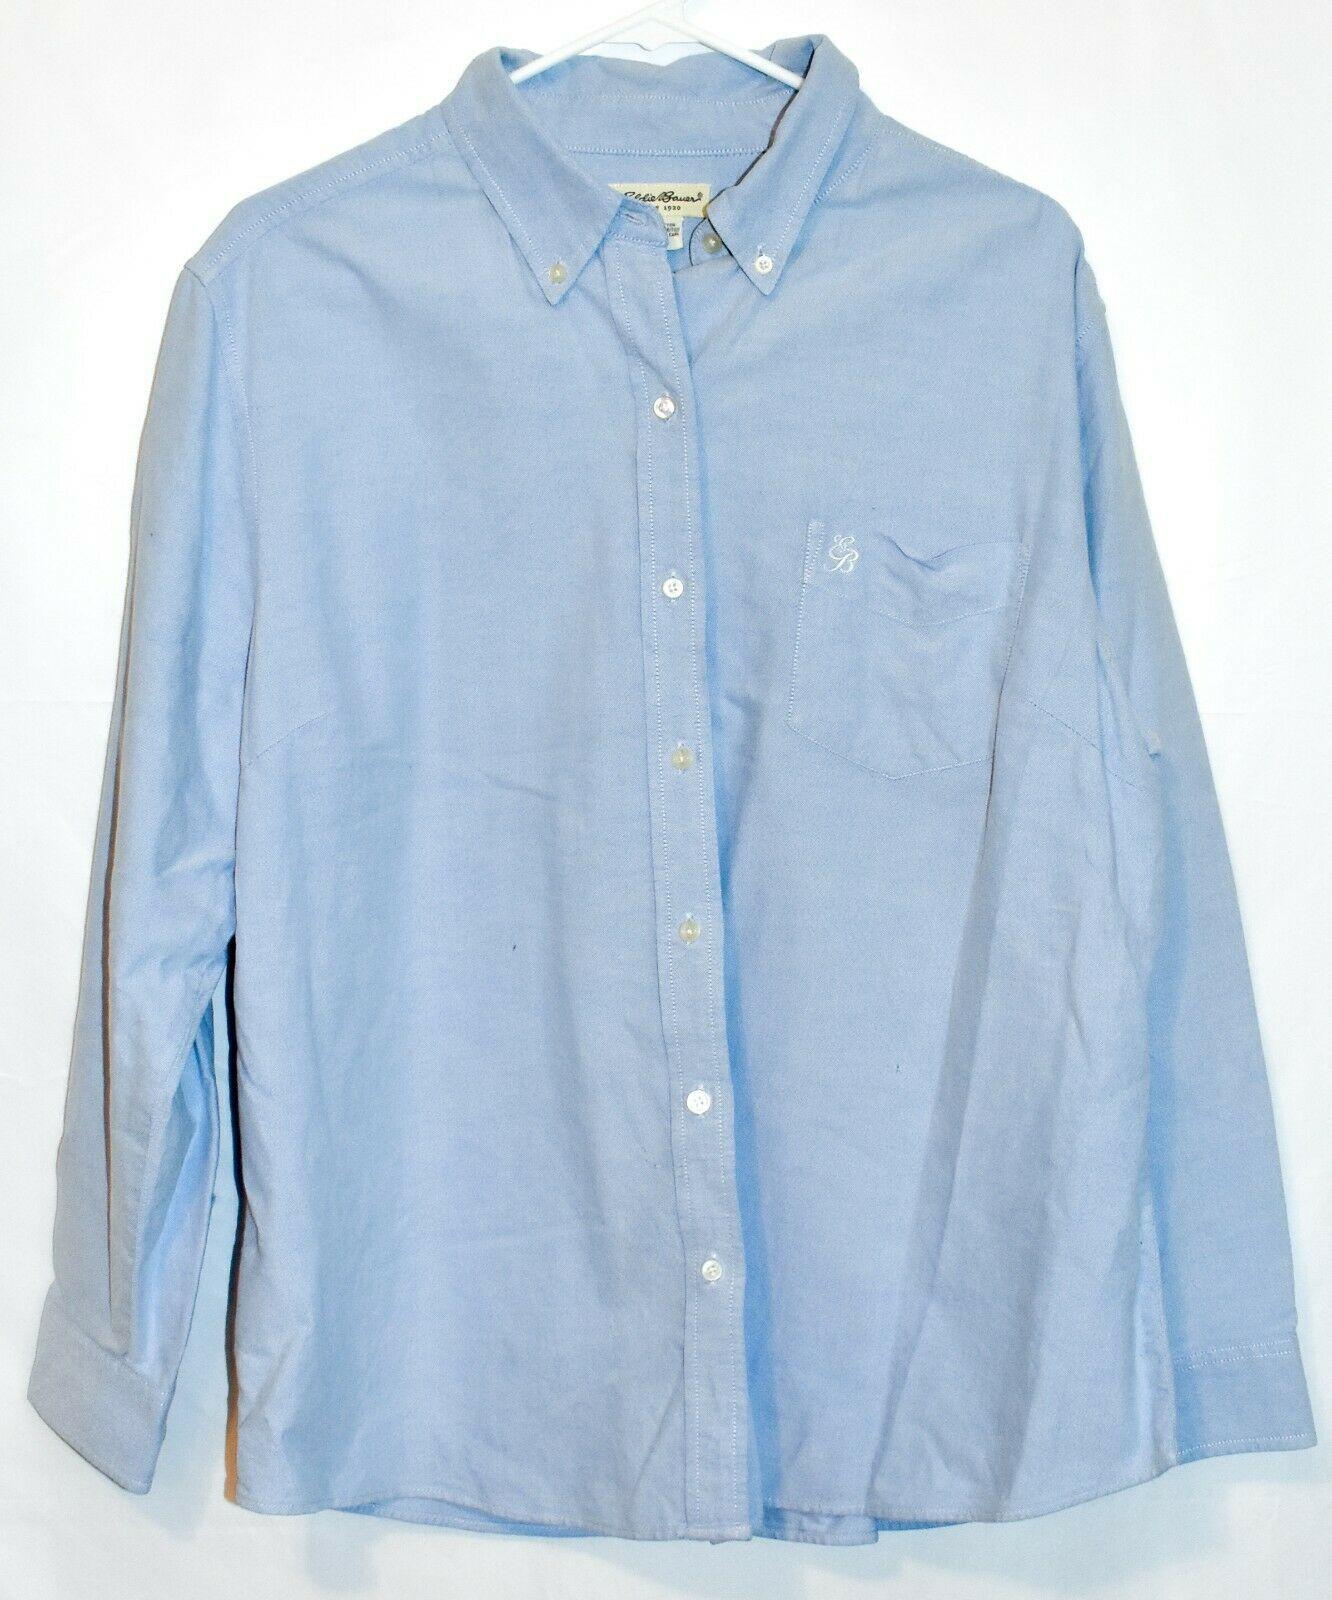 Eddie Bauer Women's Light Blue Long Sleeve Button Down Collared Shirt Size 2XL